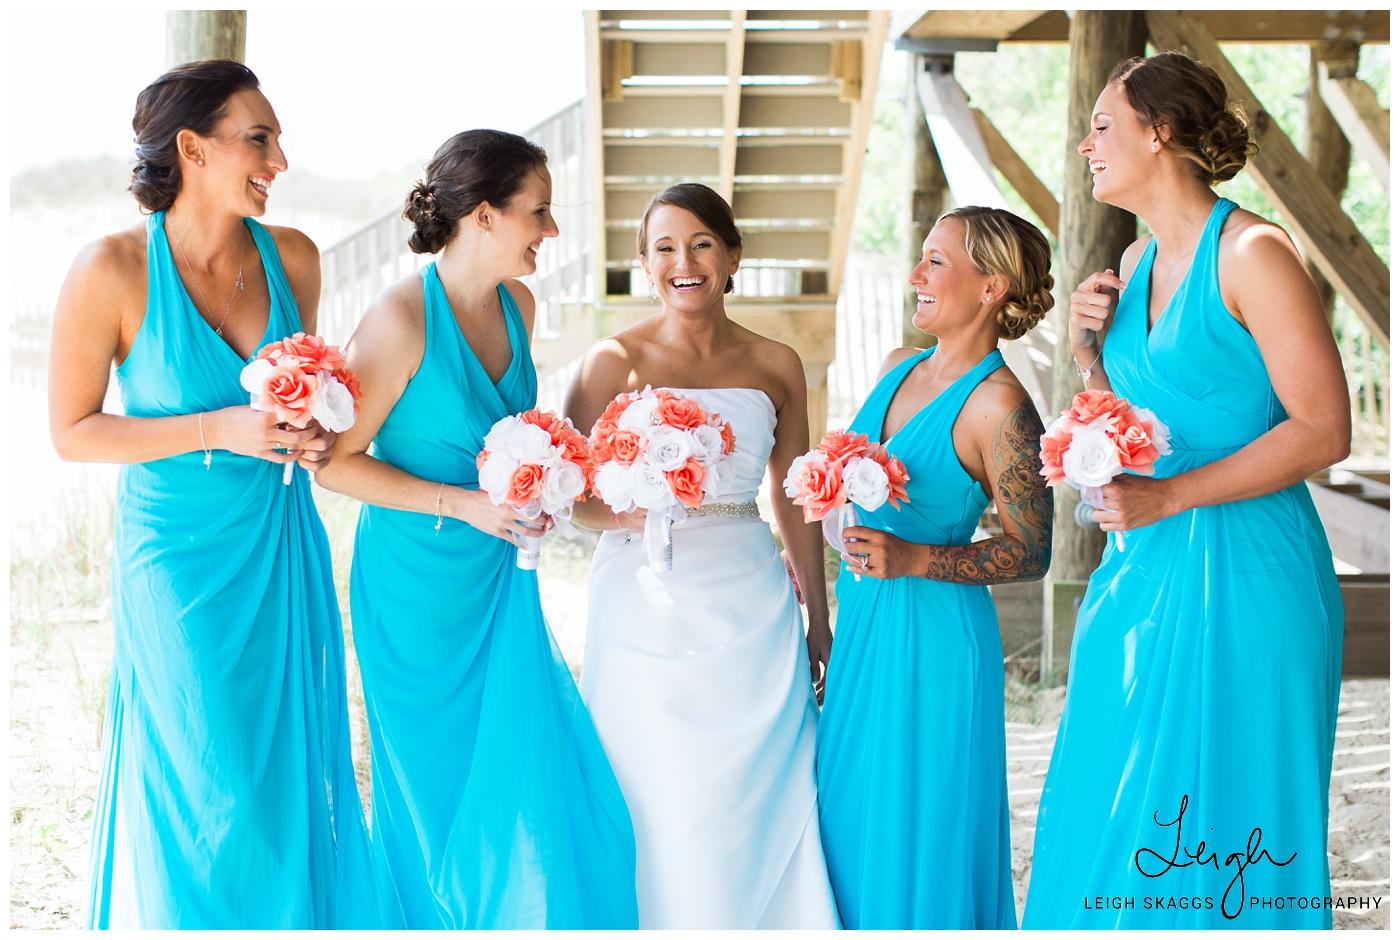 Christa & Andy   Shifting Sands Beach Wedding